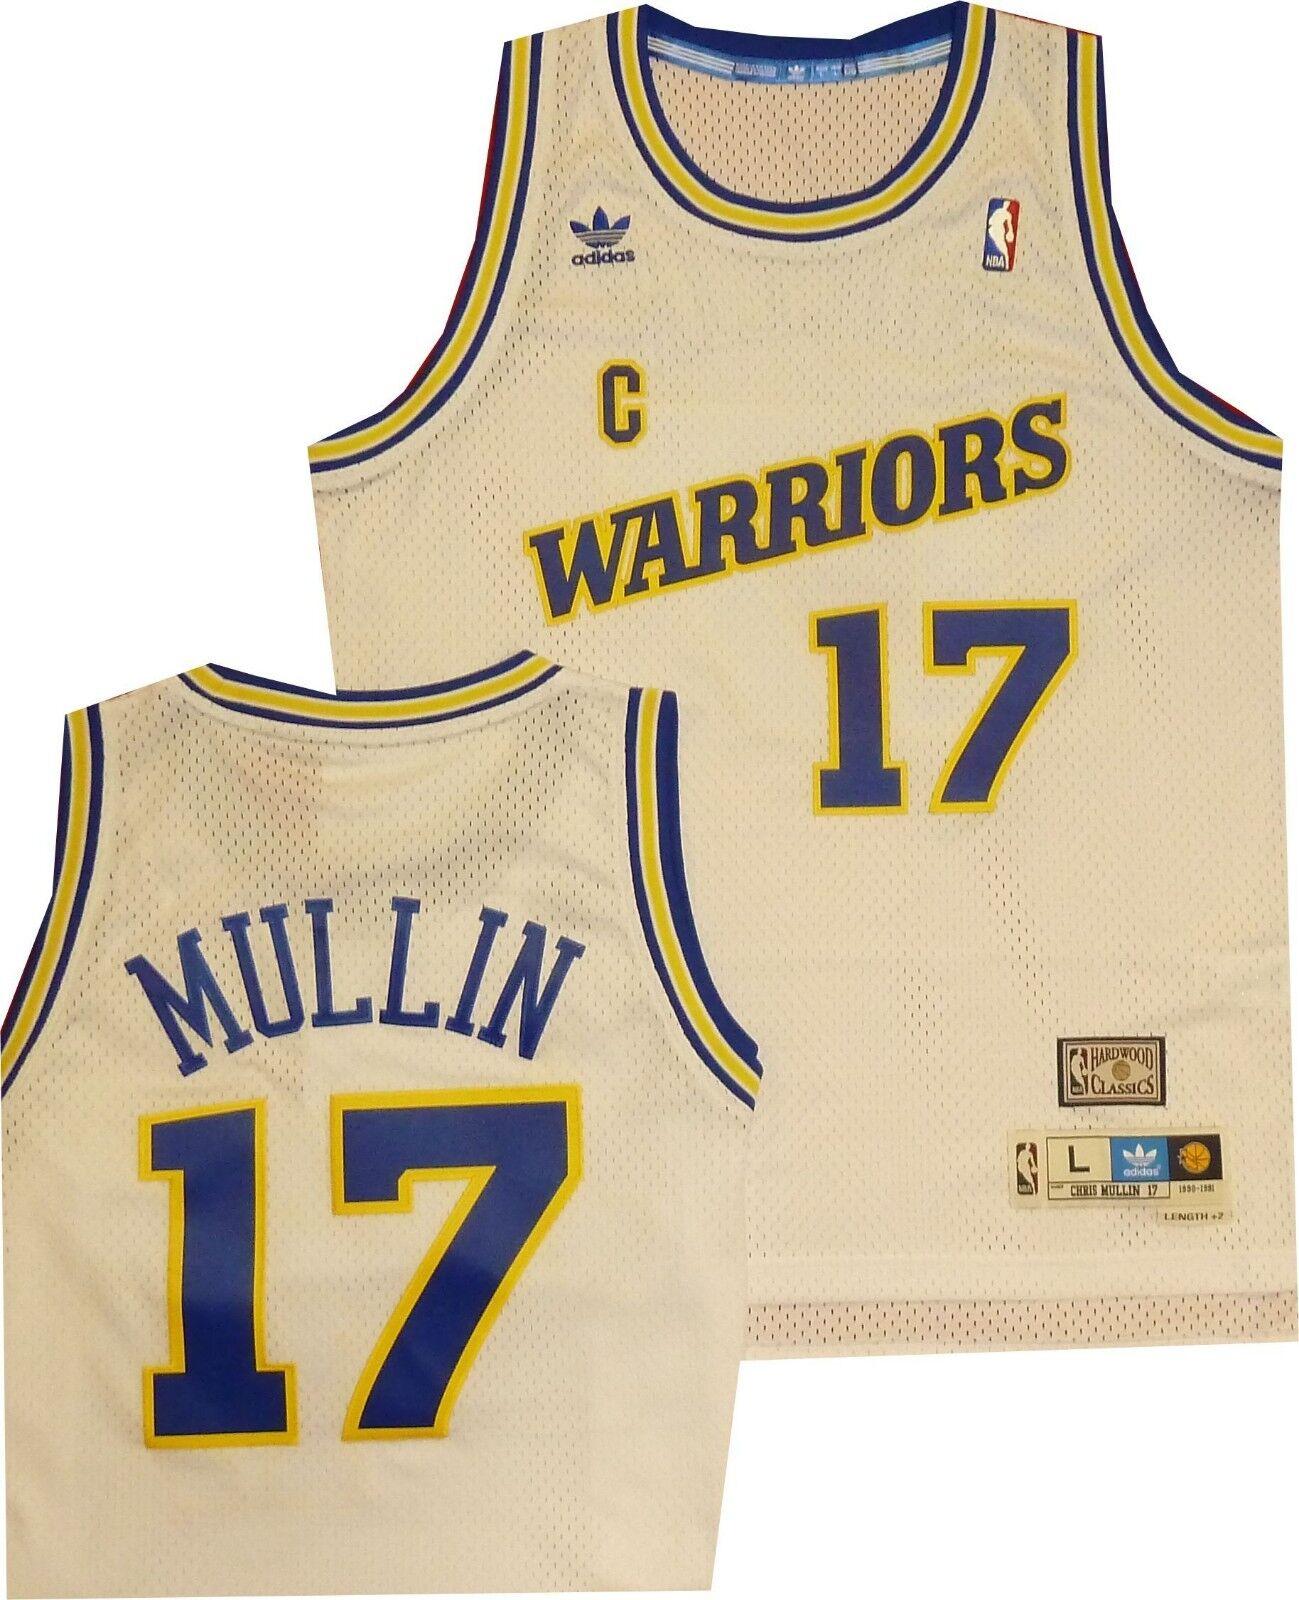 211b12ed9cb Golden State Warriors Chris Mullin Mullin Mullin White Adidas Swingman  Jersey 7484A Closeout aec8d5